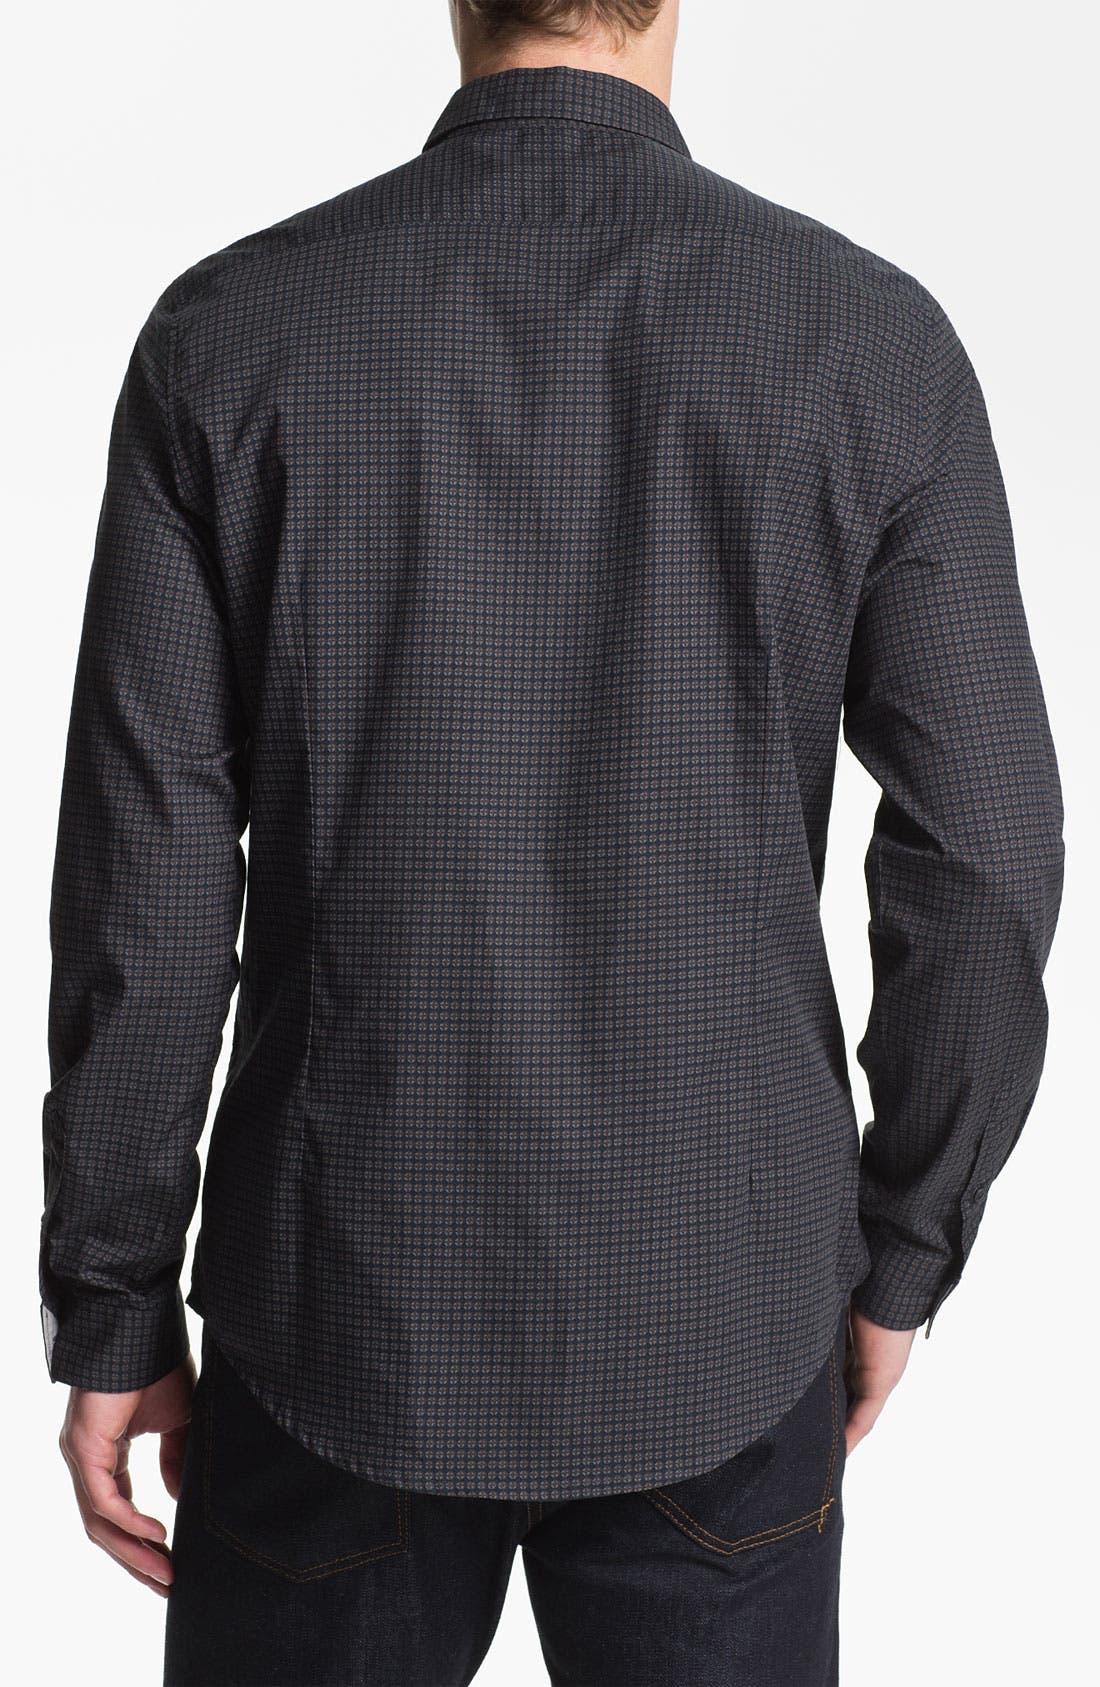 Alternate Image 2  - Ben Sherman 'Kensington' Woven Shirt